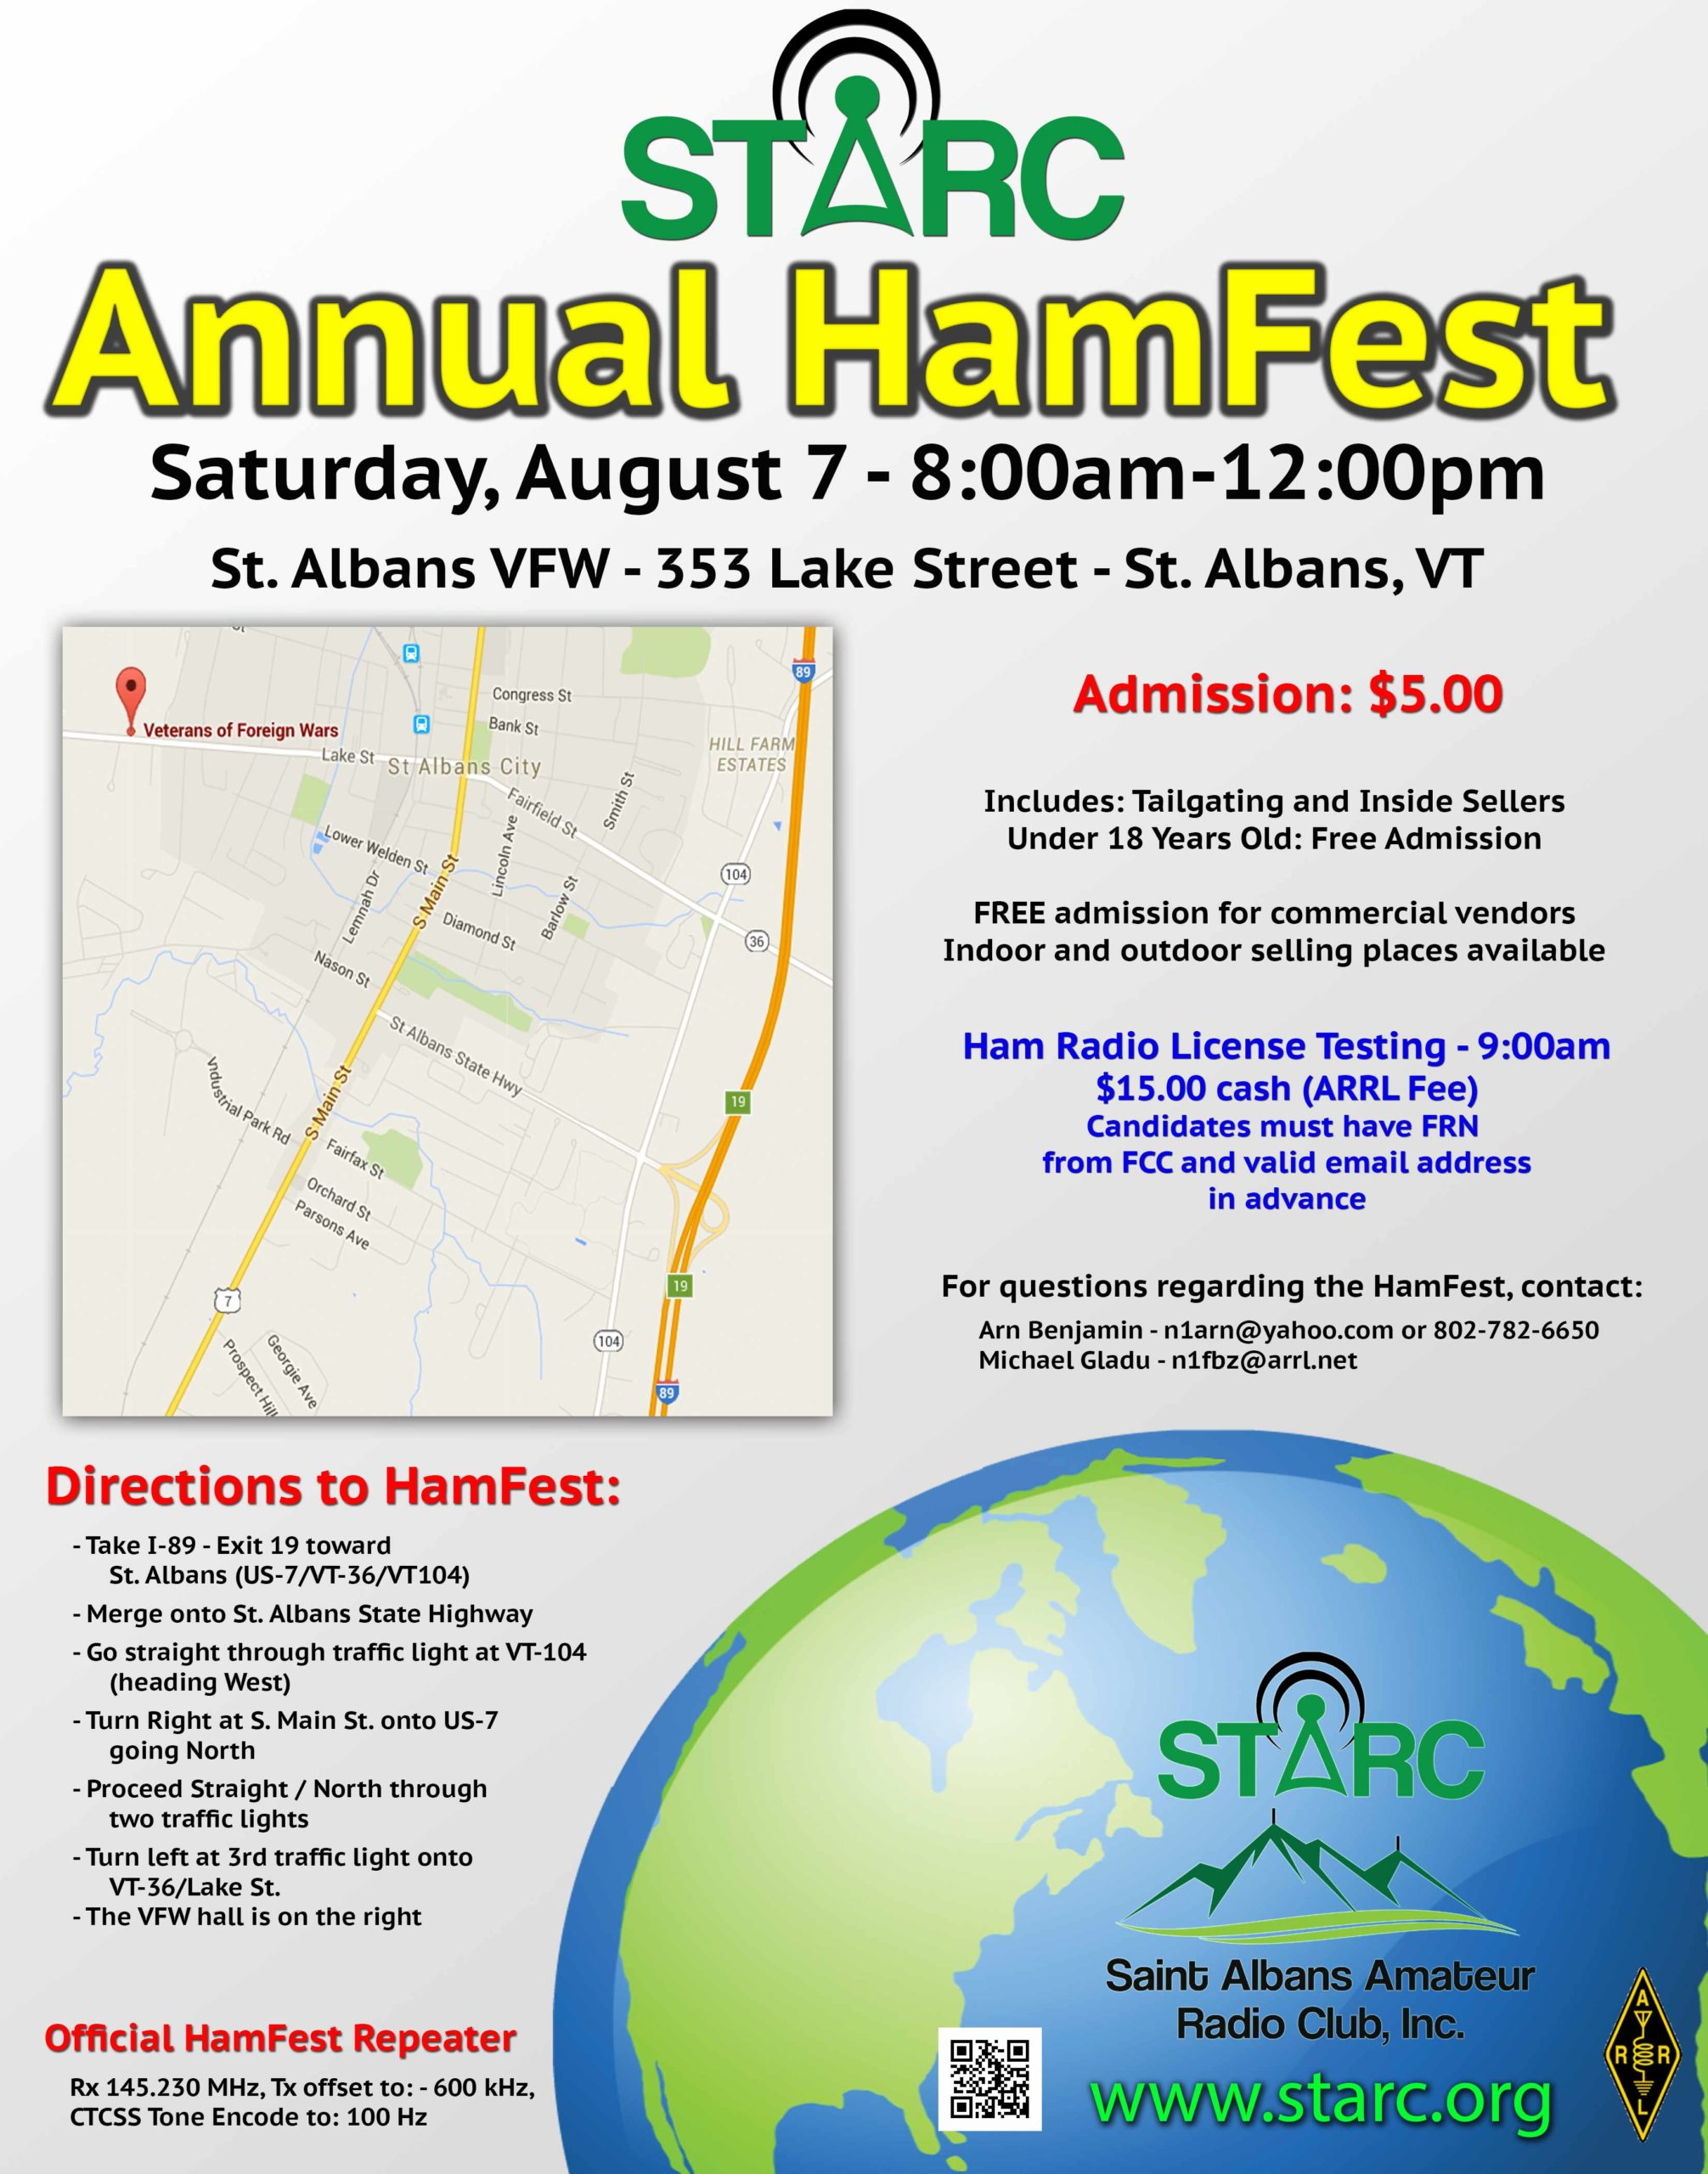 STARC-Hamfest-2021-scaled.jpg